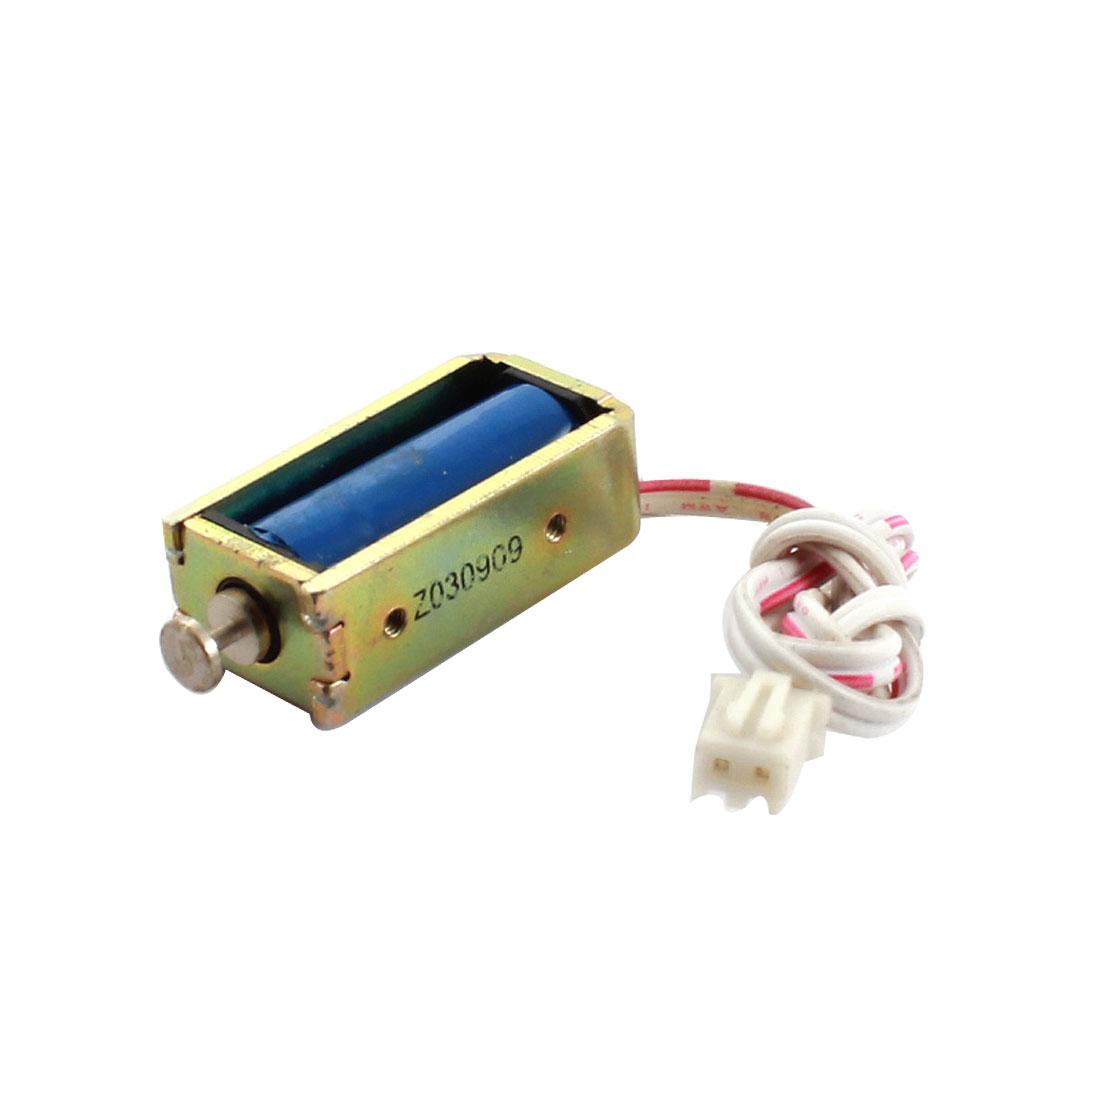 DC 24V 7.2W 30g/3mm Pull Type Electric Magnet Solenoid Electromagnet